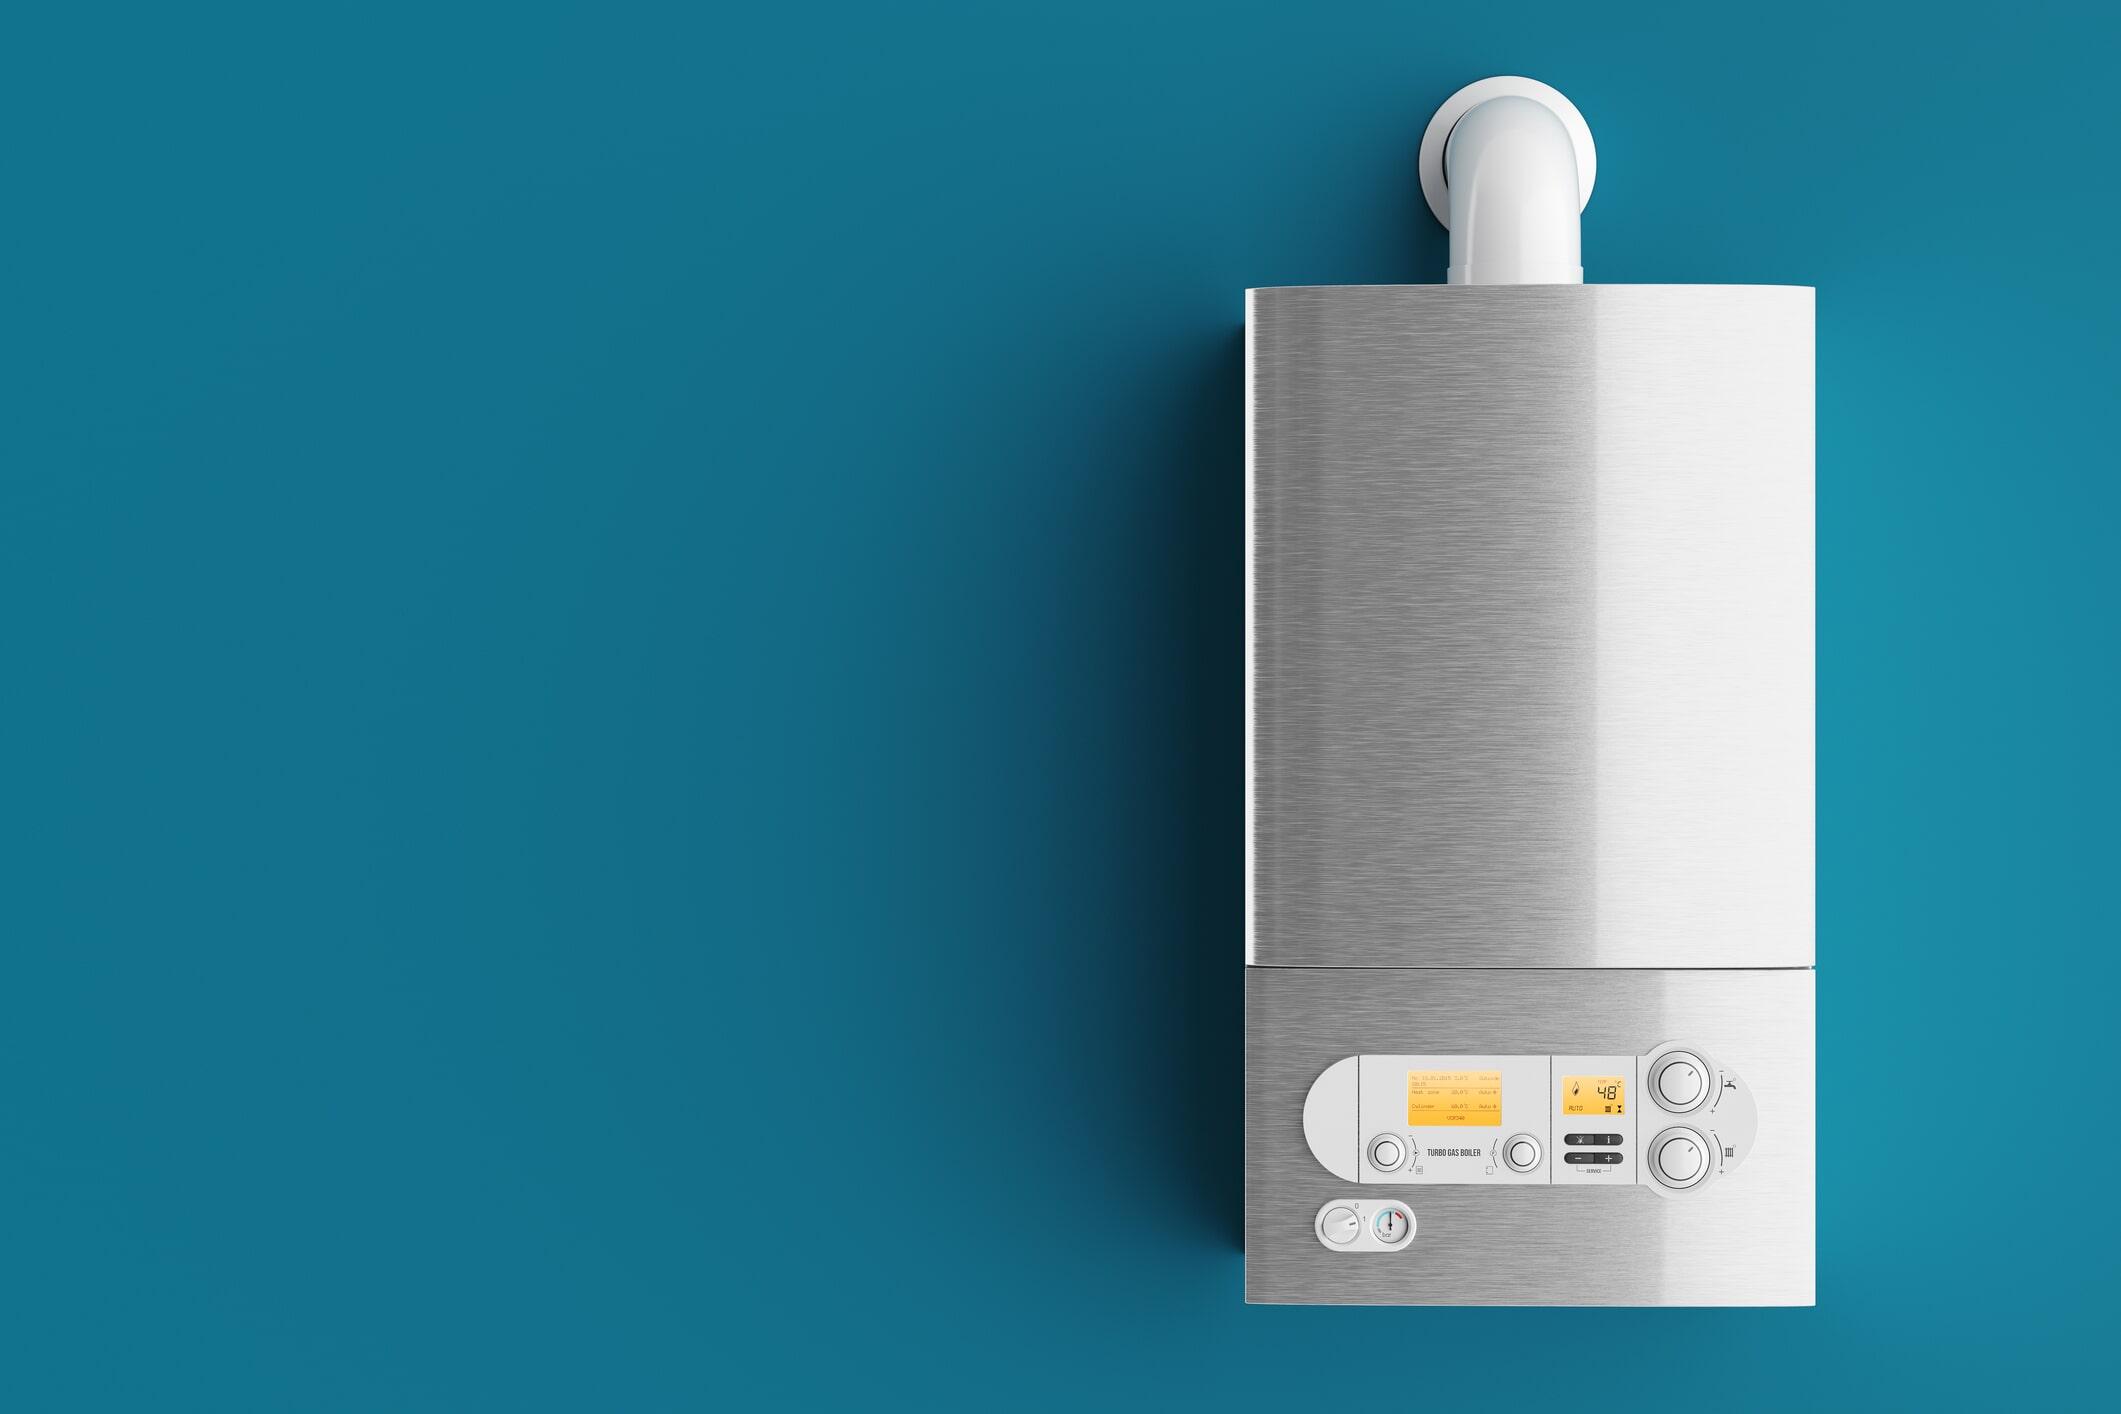 Plumbing Repair - Edmond, OK - Edmond Air Conditioning, Heating ...